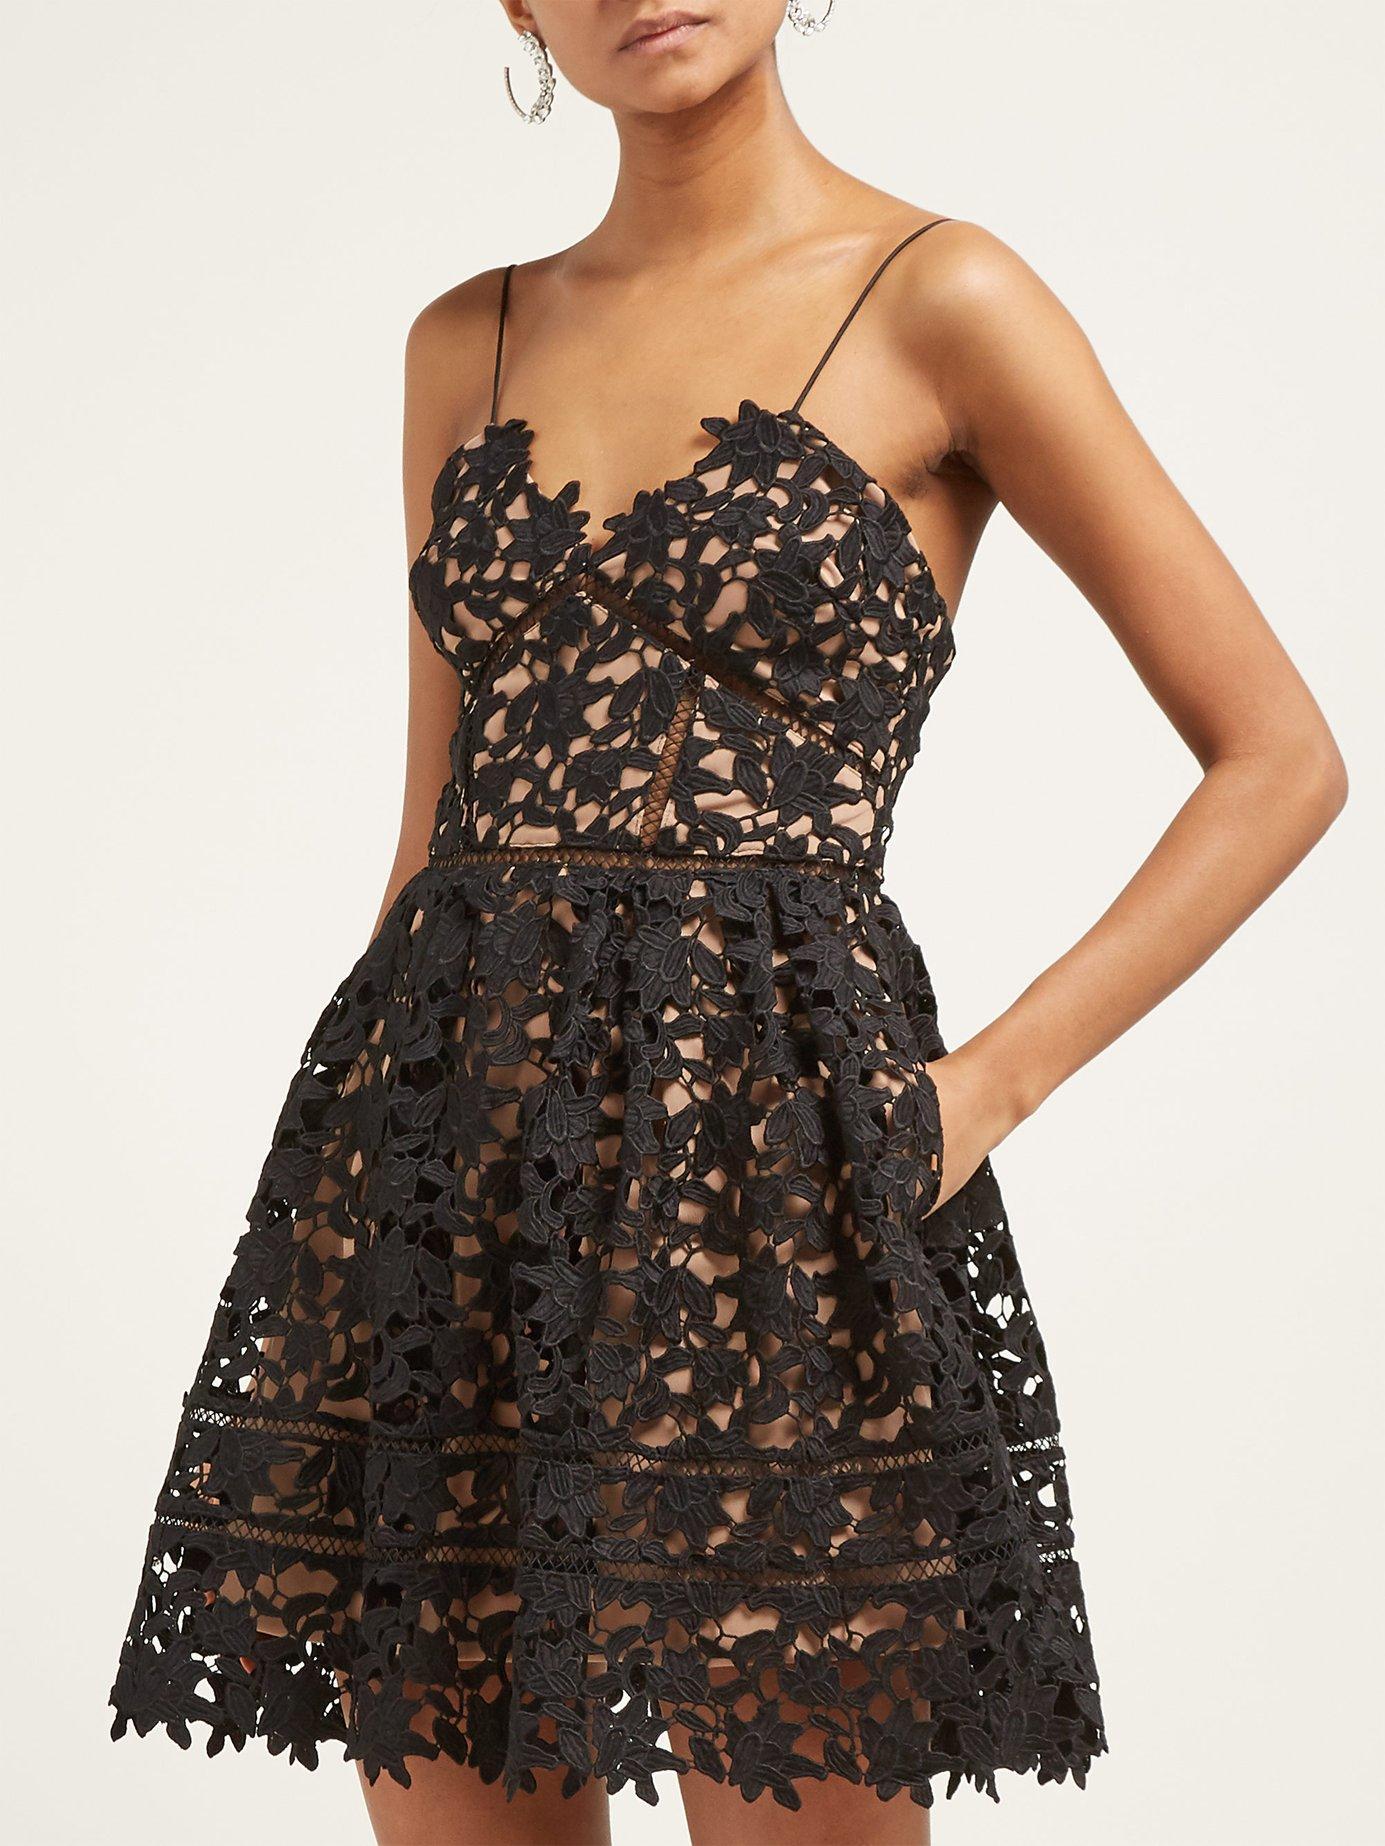 09a02d70a655f6 Lyst - Self-Portrait Azaelea Floral Lace Mini Dress in Black